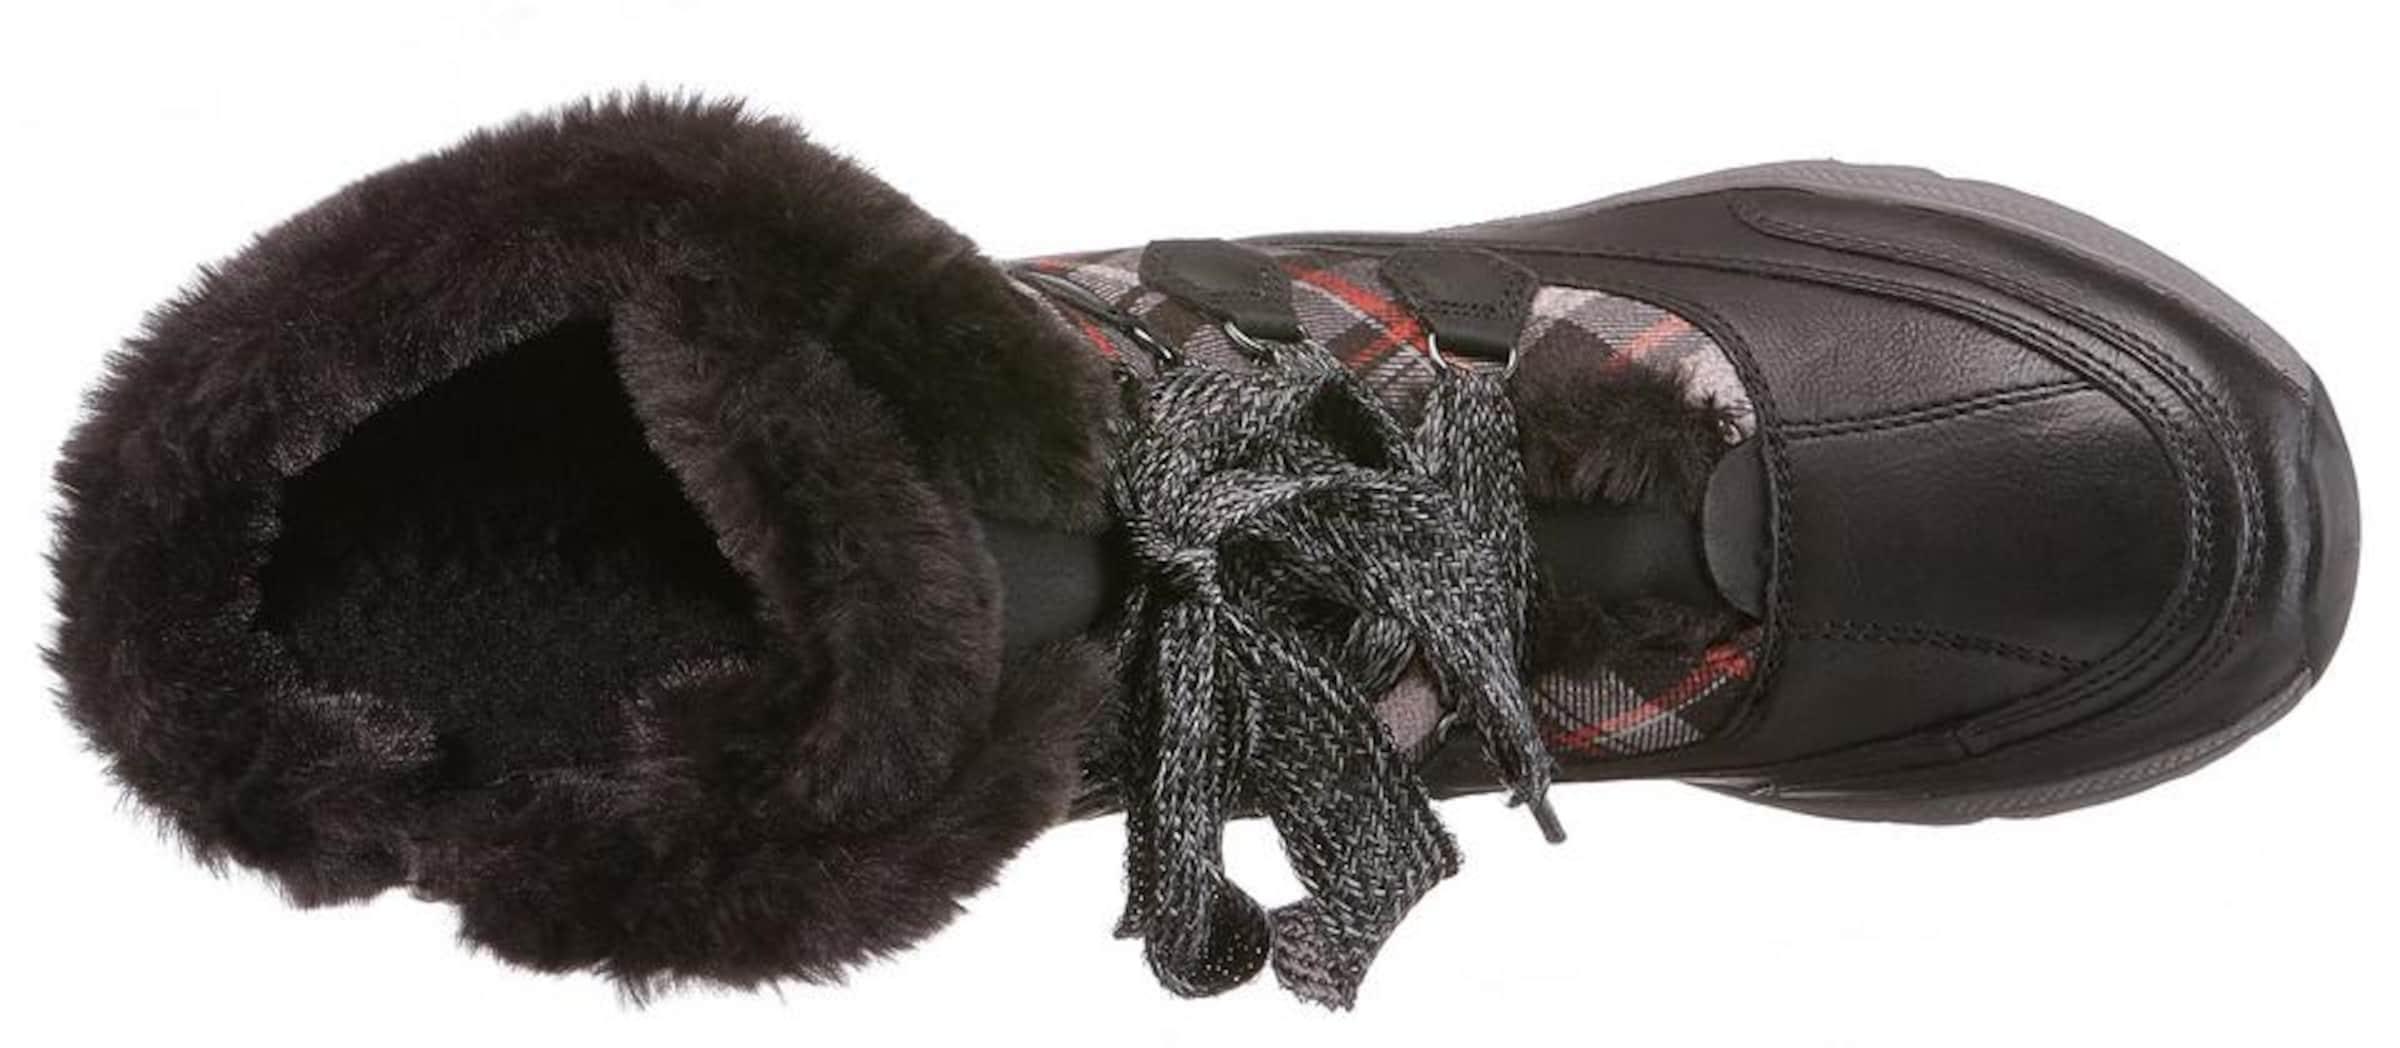 MARCO TOZZI TOZZI TOZZI Winterstiefel Textil, sonstiges Material Markenrabatt 39bf3c